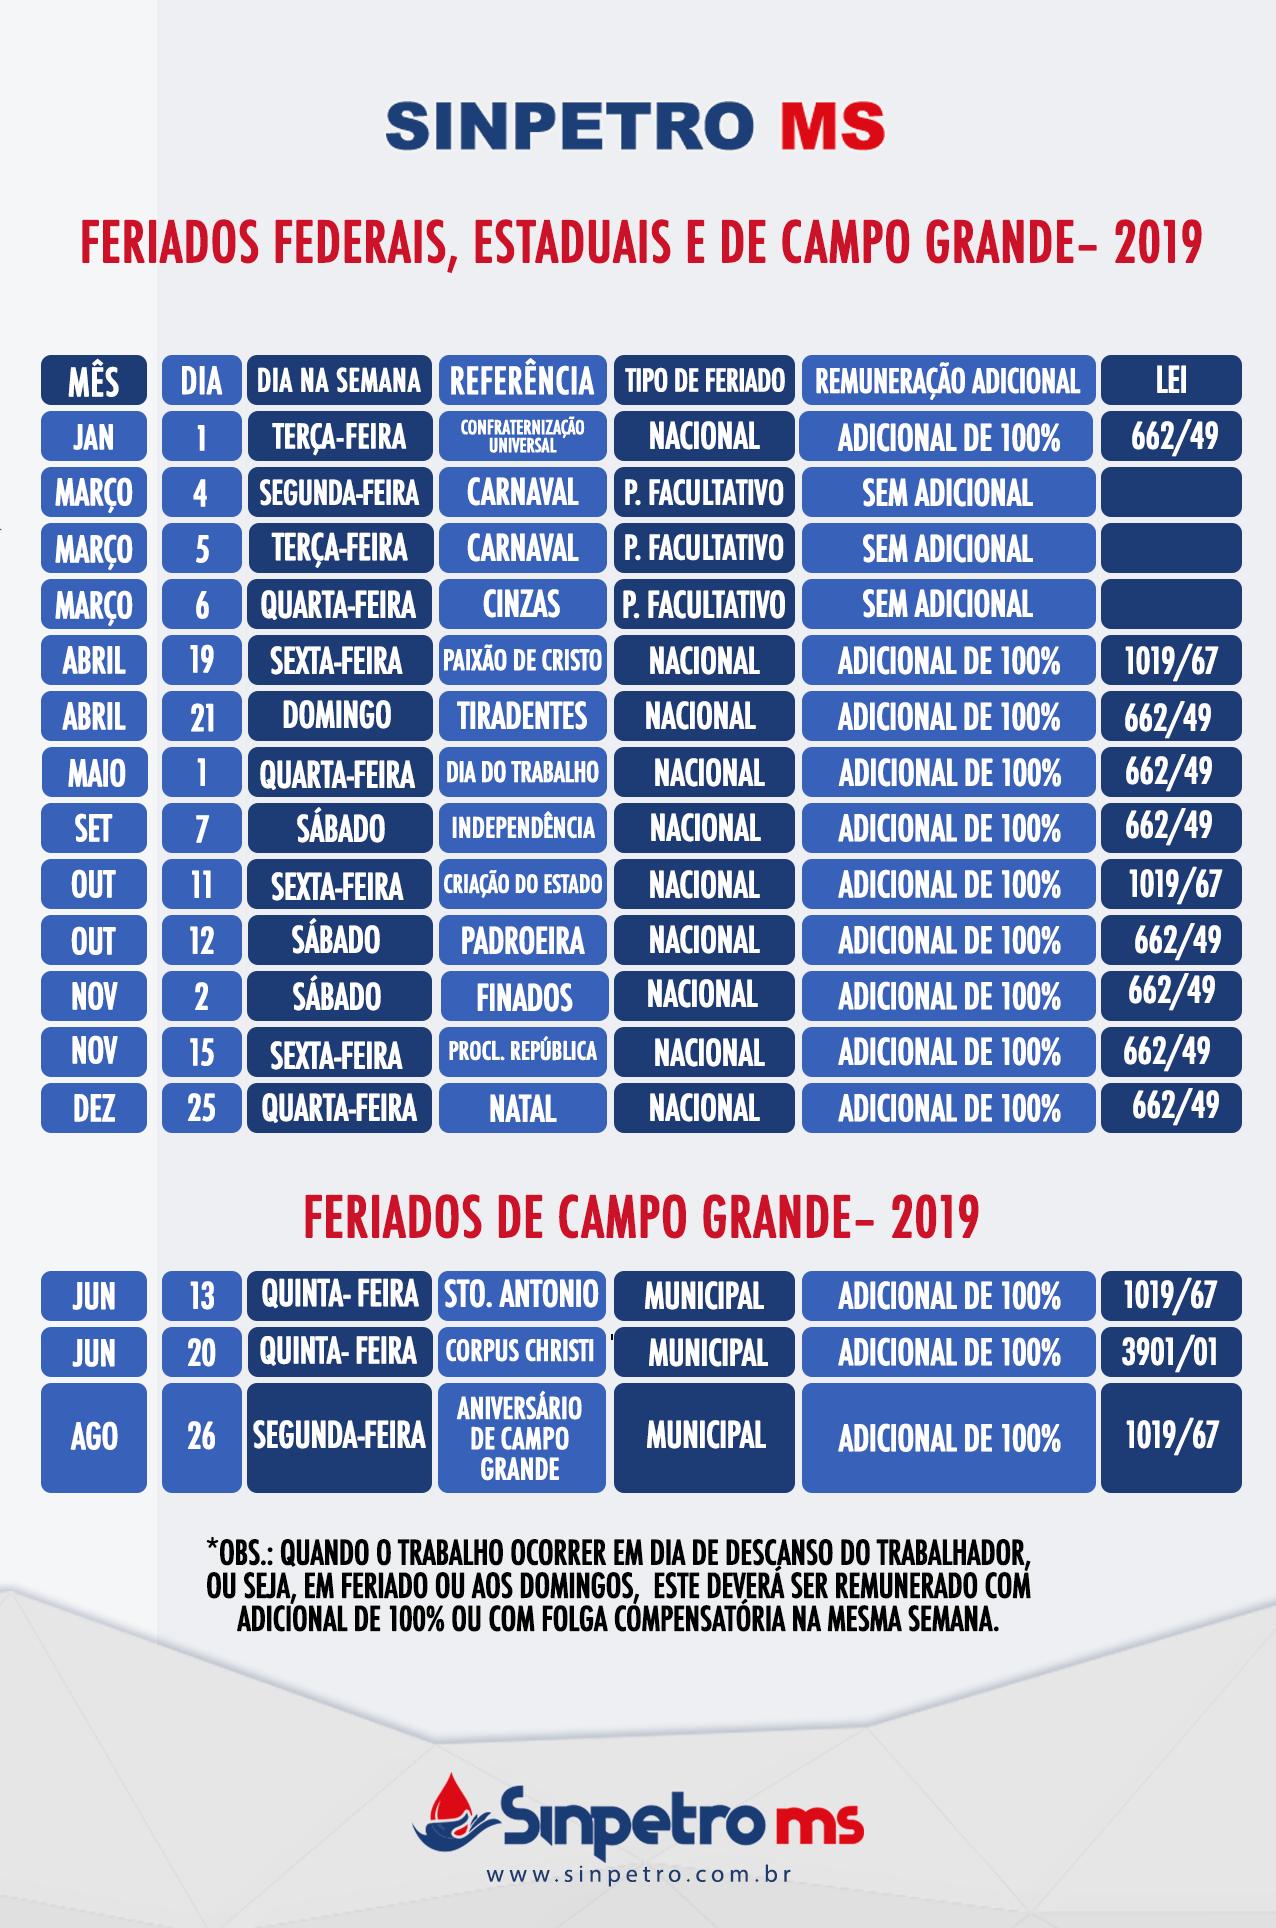 Calendario 2019 Campo Grande Ms.Calendario De Feriados Sinpetro Ms